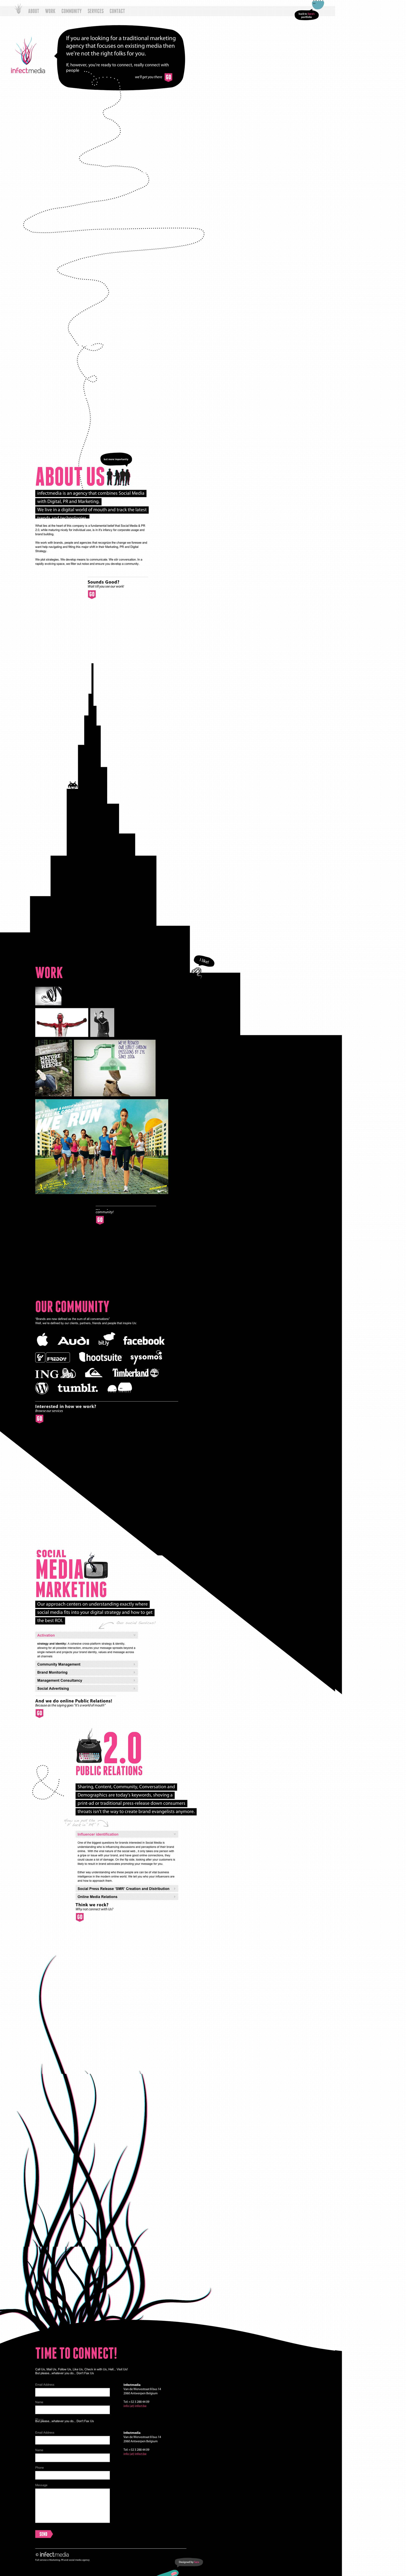 infectmedia Website Screenshot